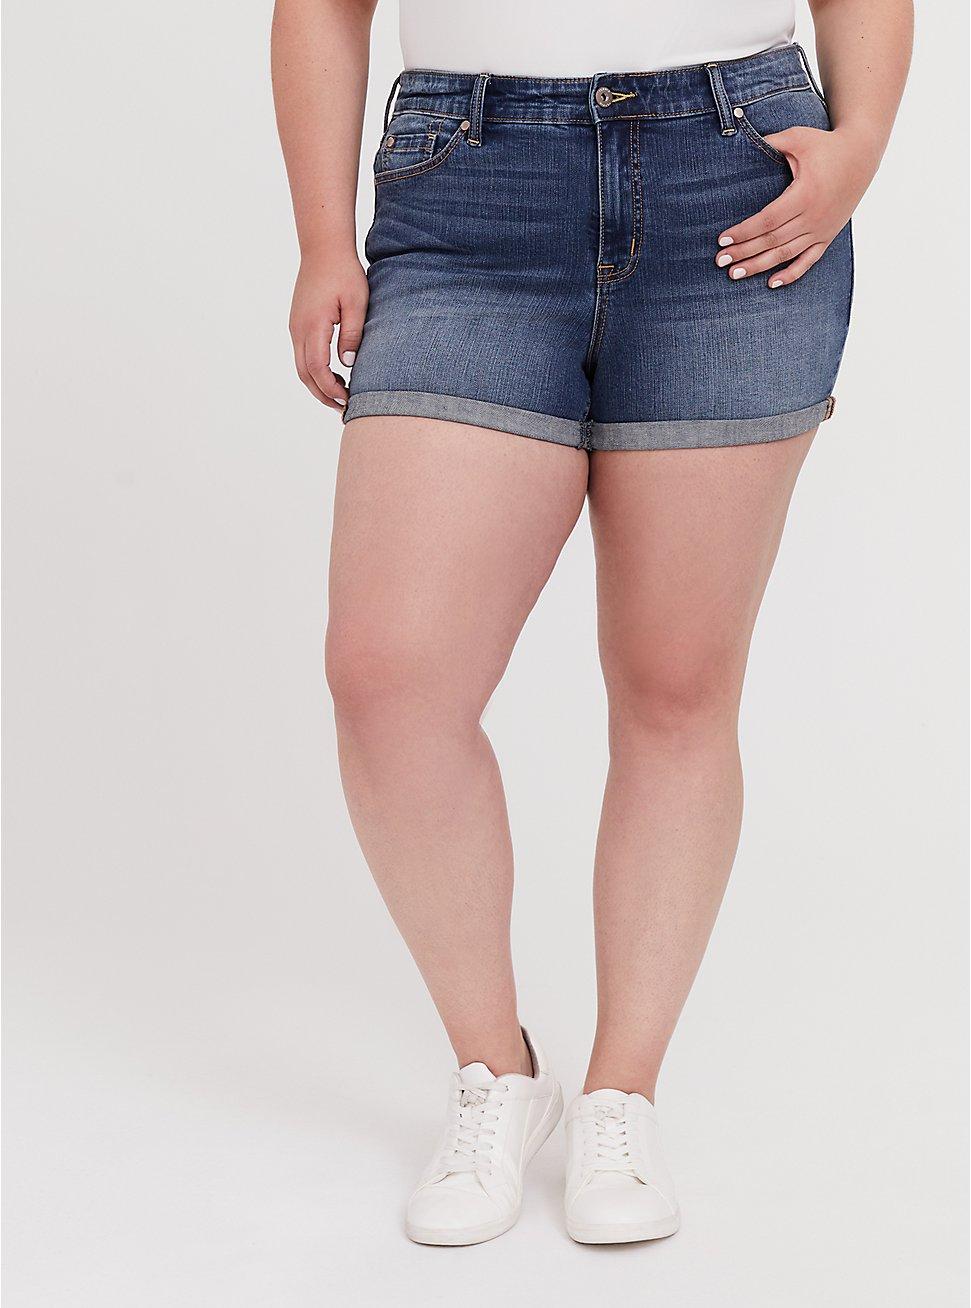 High Rise Short Short - Vintage Stretch Medium Wash, HANG TEN, hi-res